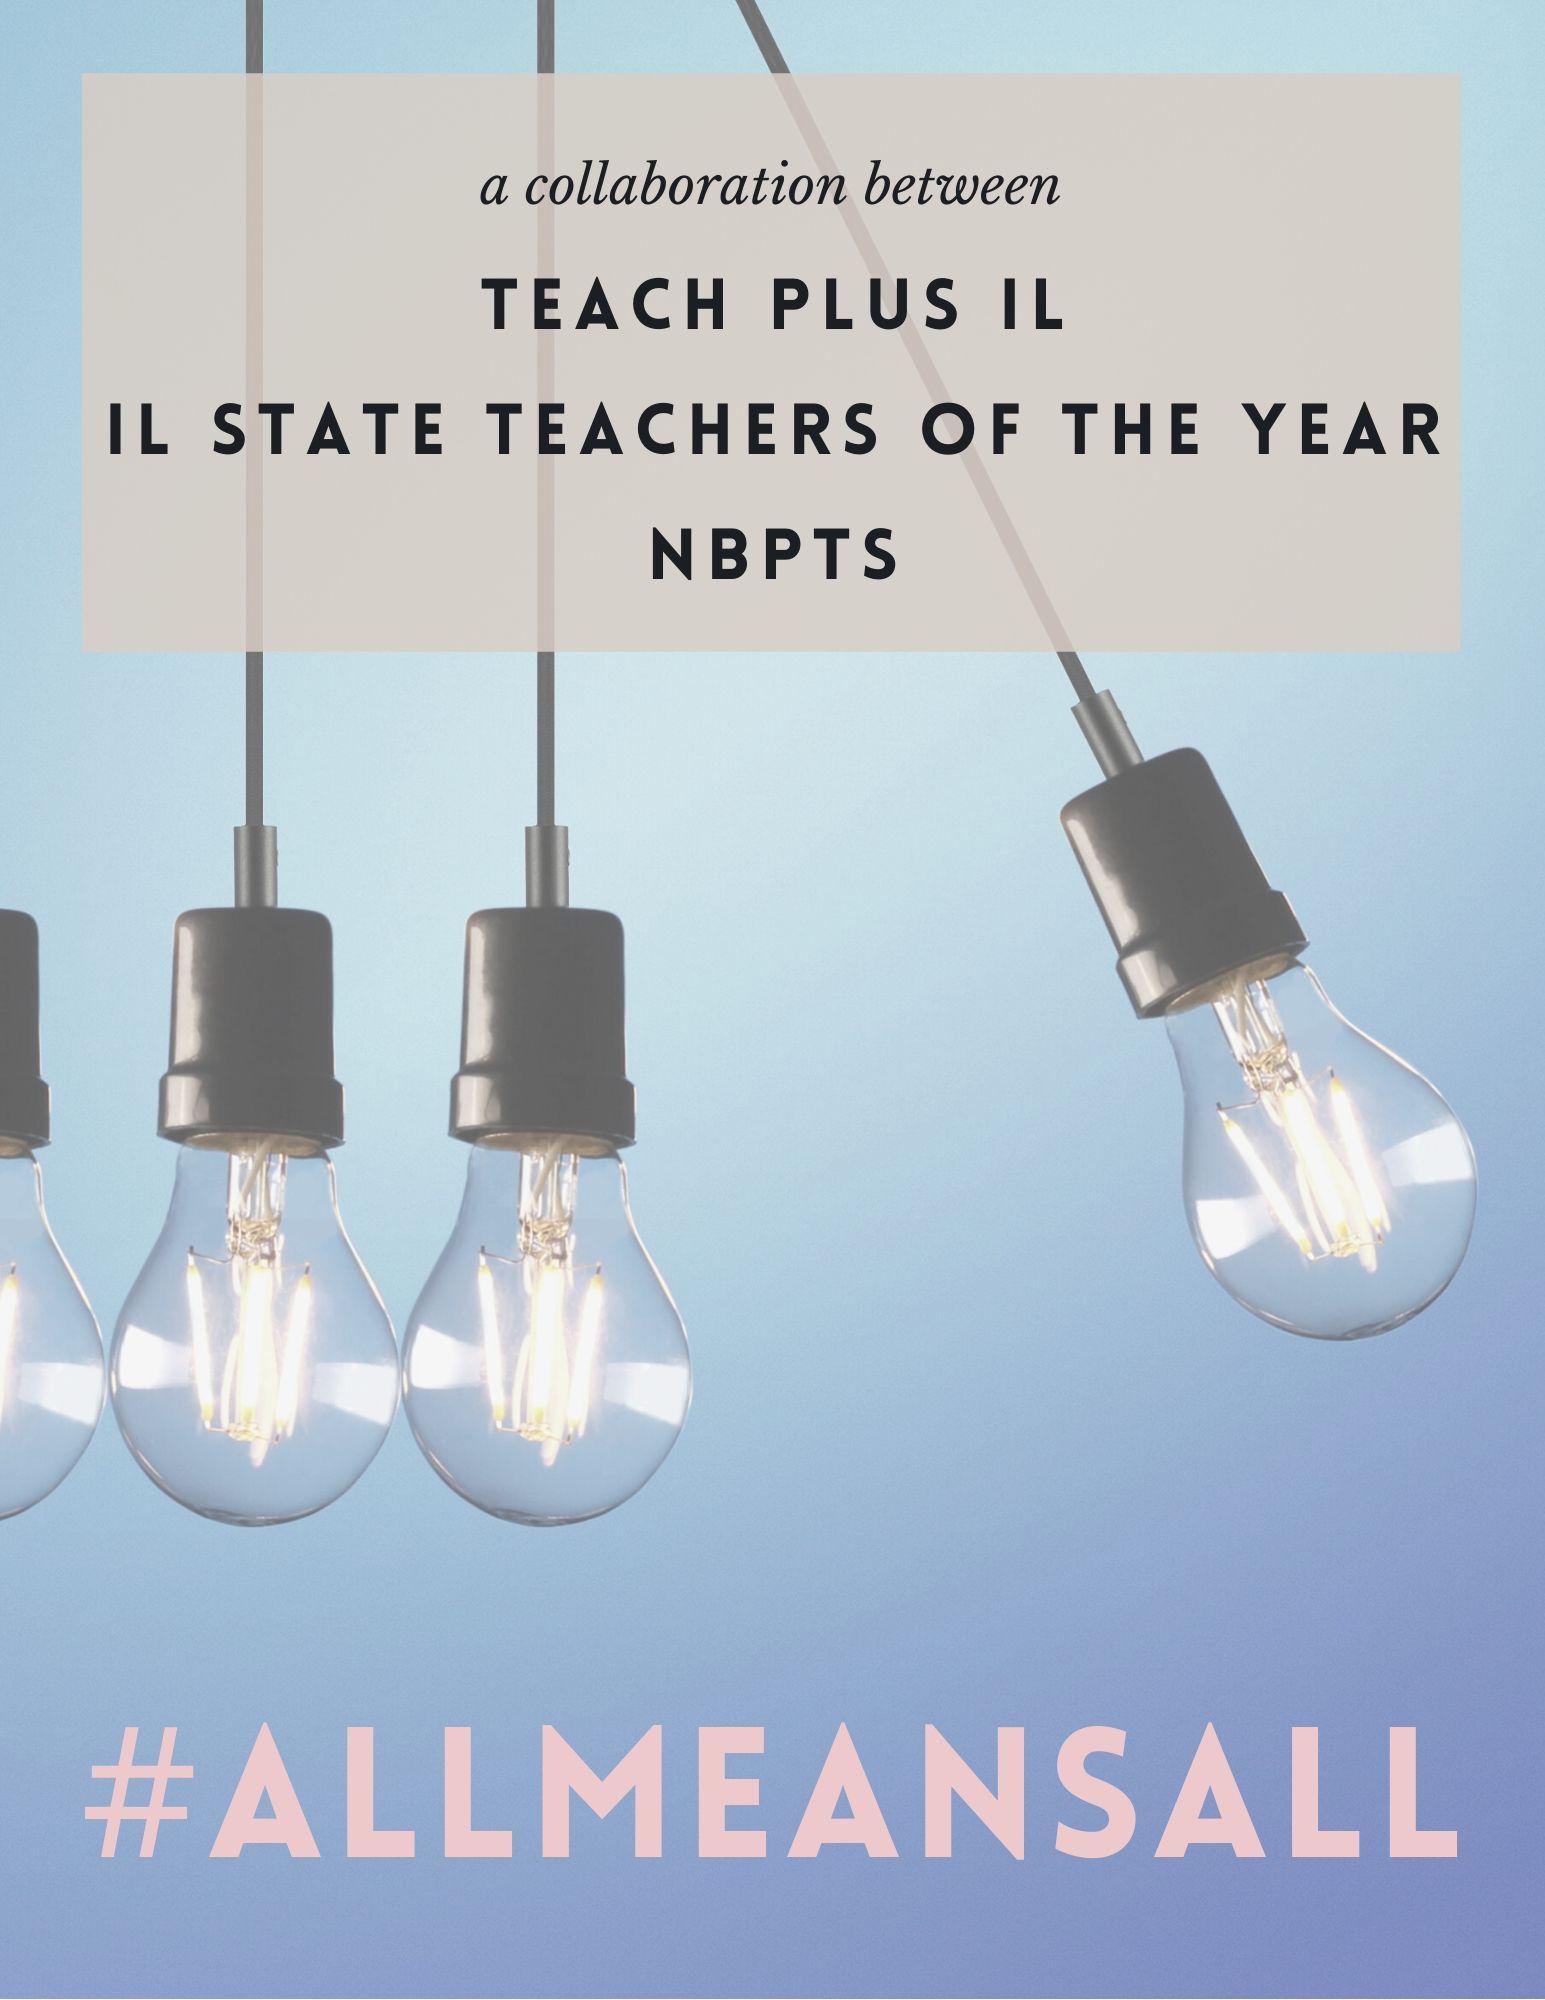 #AllMeansAll